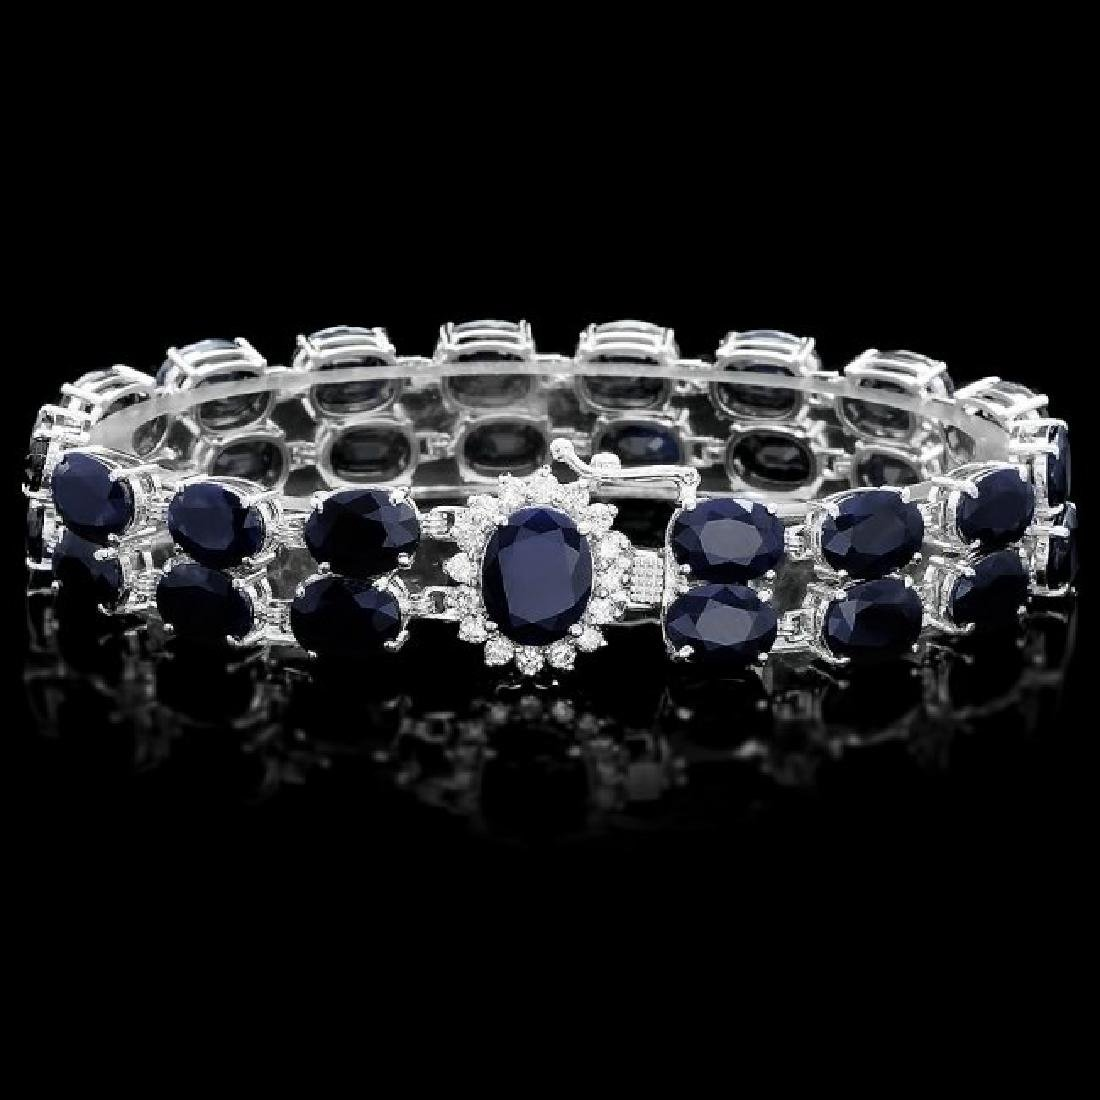 14k Gold 53.5ct Sapphire 0.60ct Diamond Bracelet